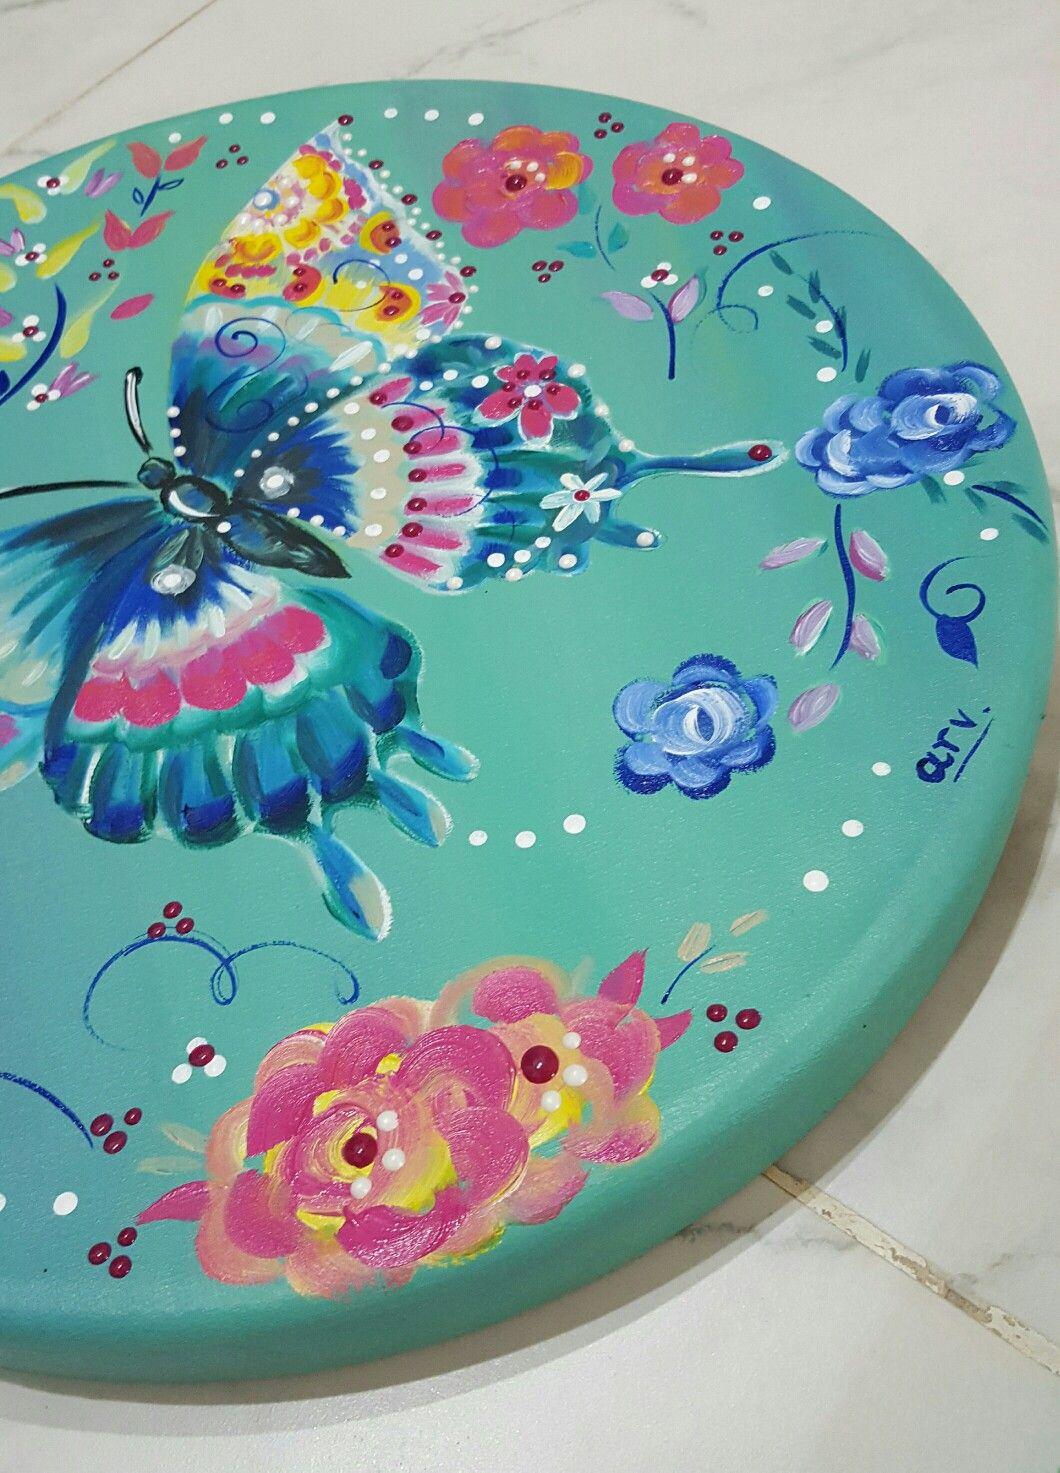 🎨🌸 #óleo 40 cm d diámetro Inspirado en el arte d Starla Michelle #arte #libertad #pinceladas #colores 🌸🎨 @albaartistica